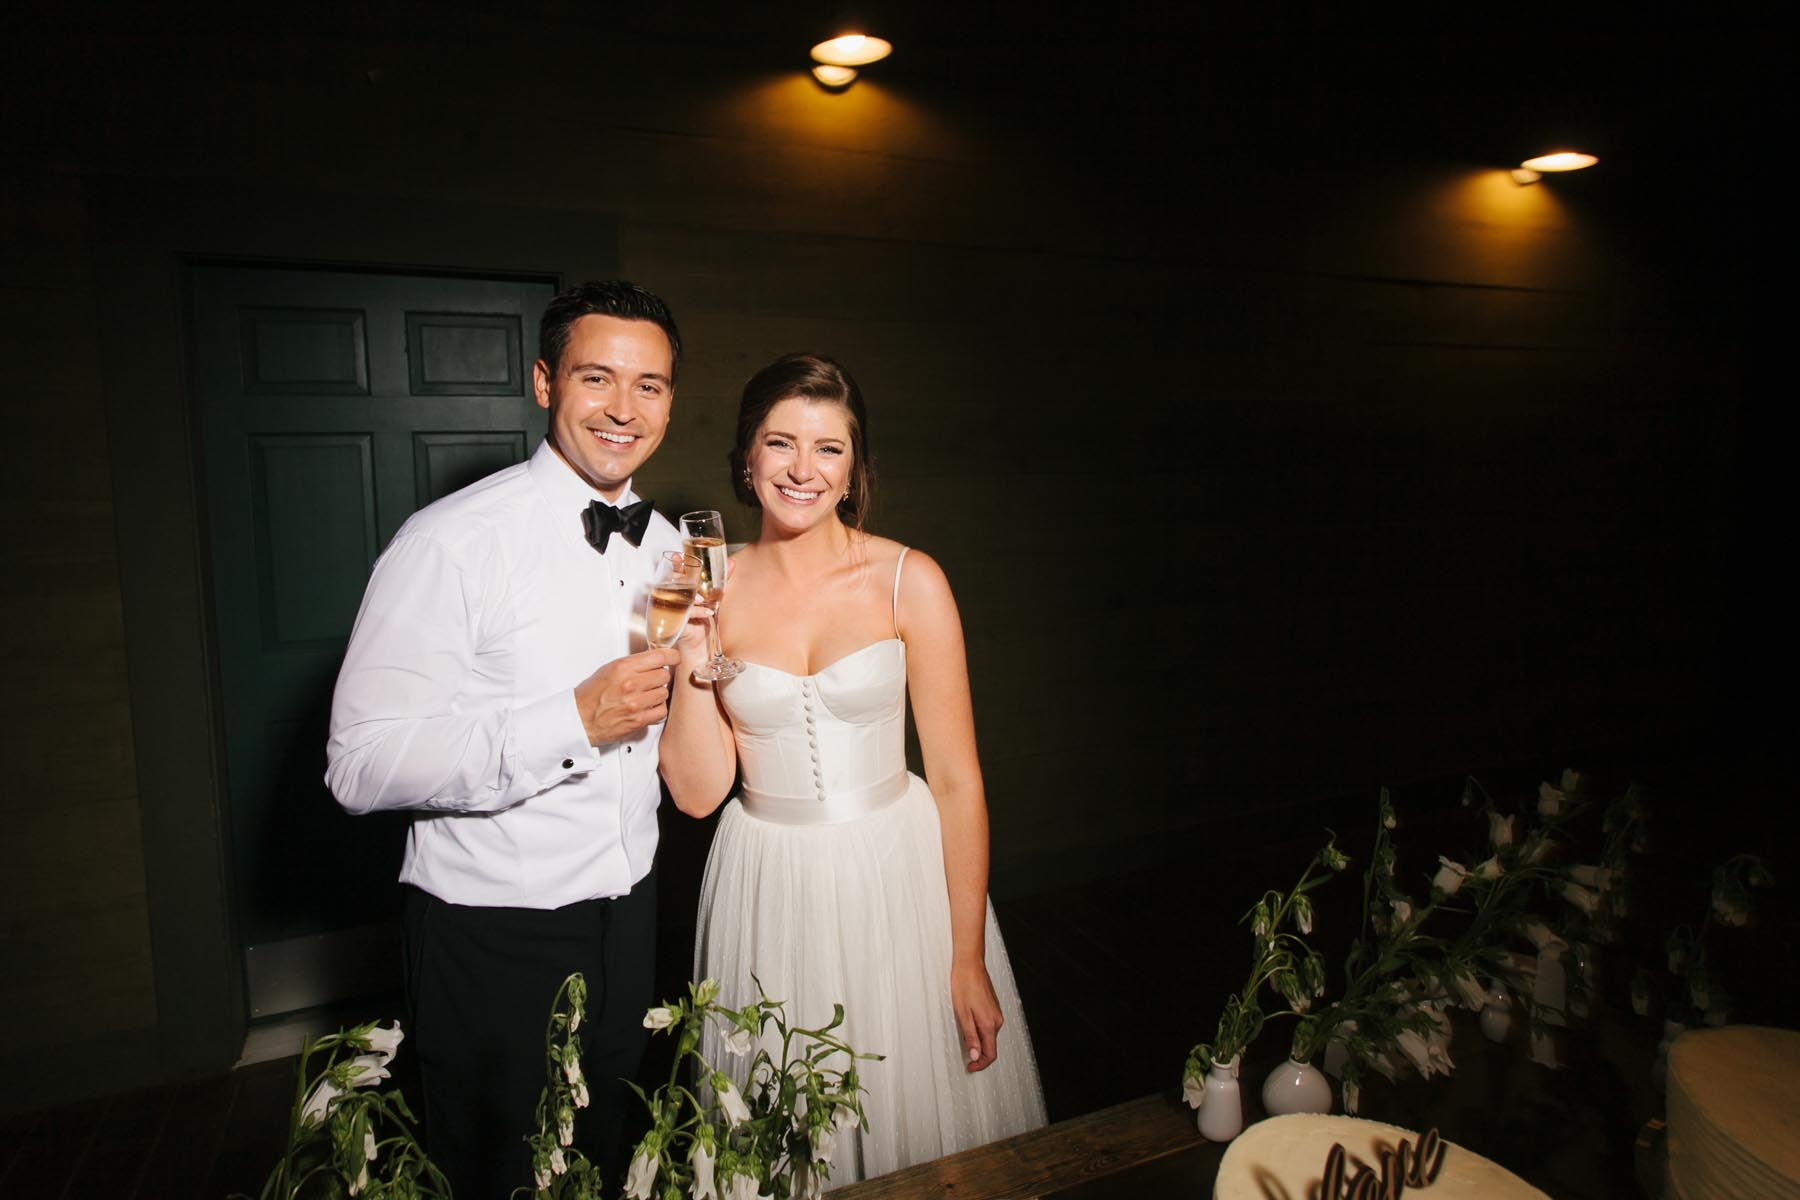 lowry wedding blog eden garden florida wedding-147